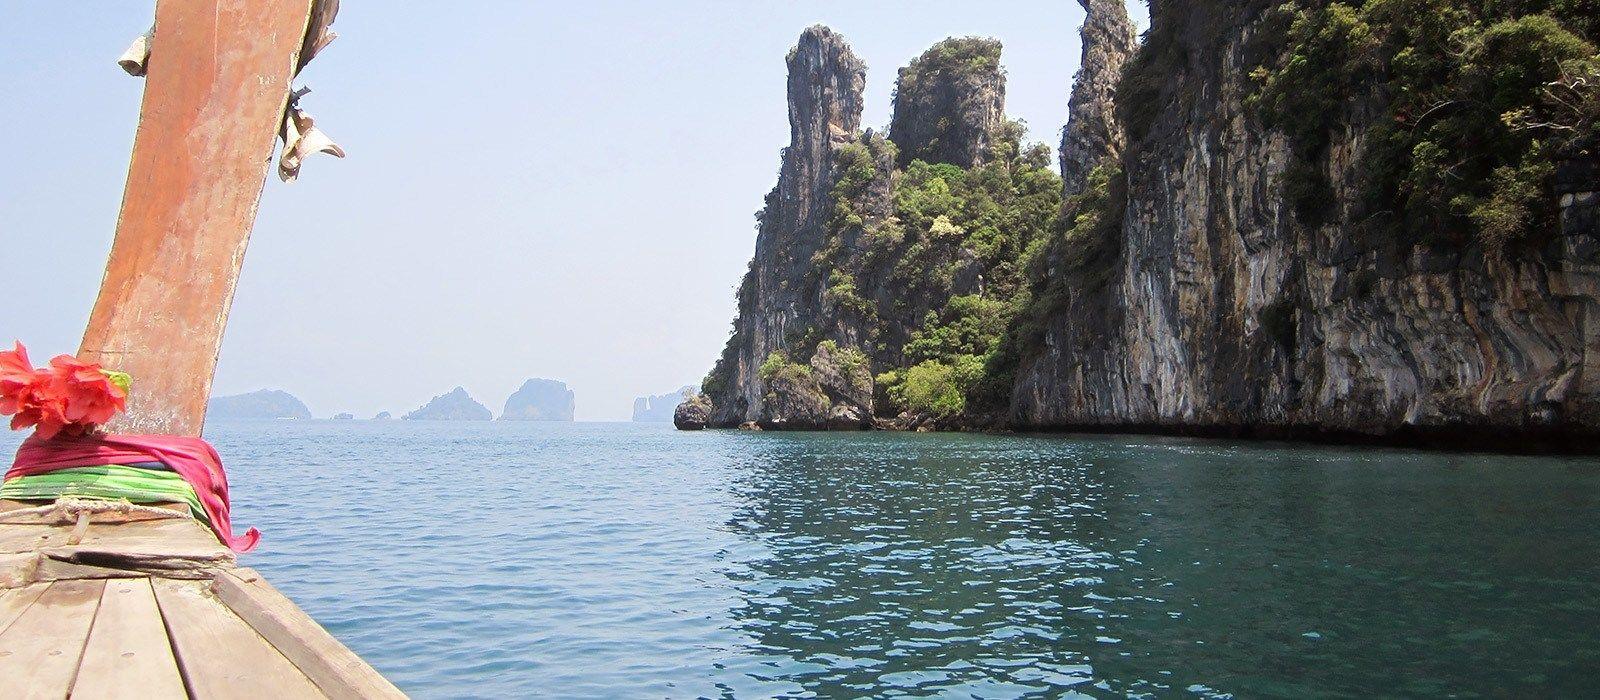 Destination Koh Yao Yai Thailand